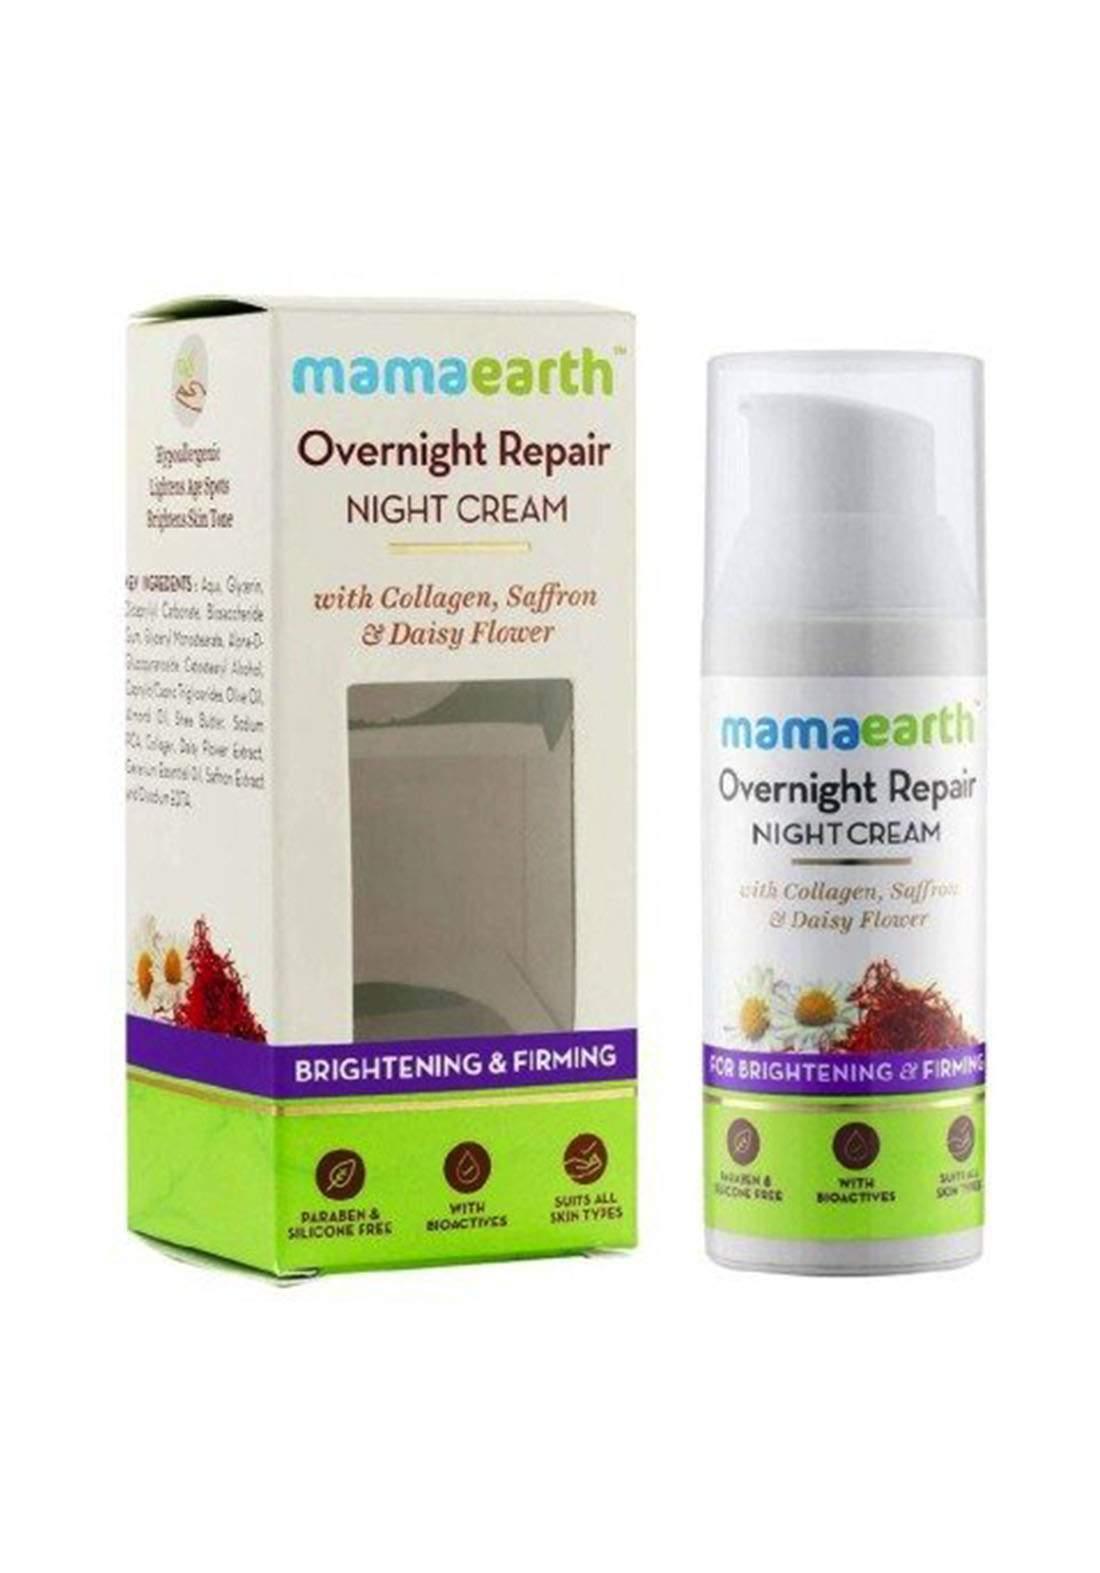 Mamaearth Overnight Repair Night Cream 50ml كريم ليلي للبشرة